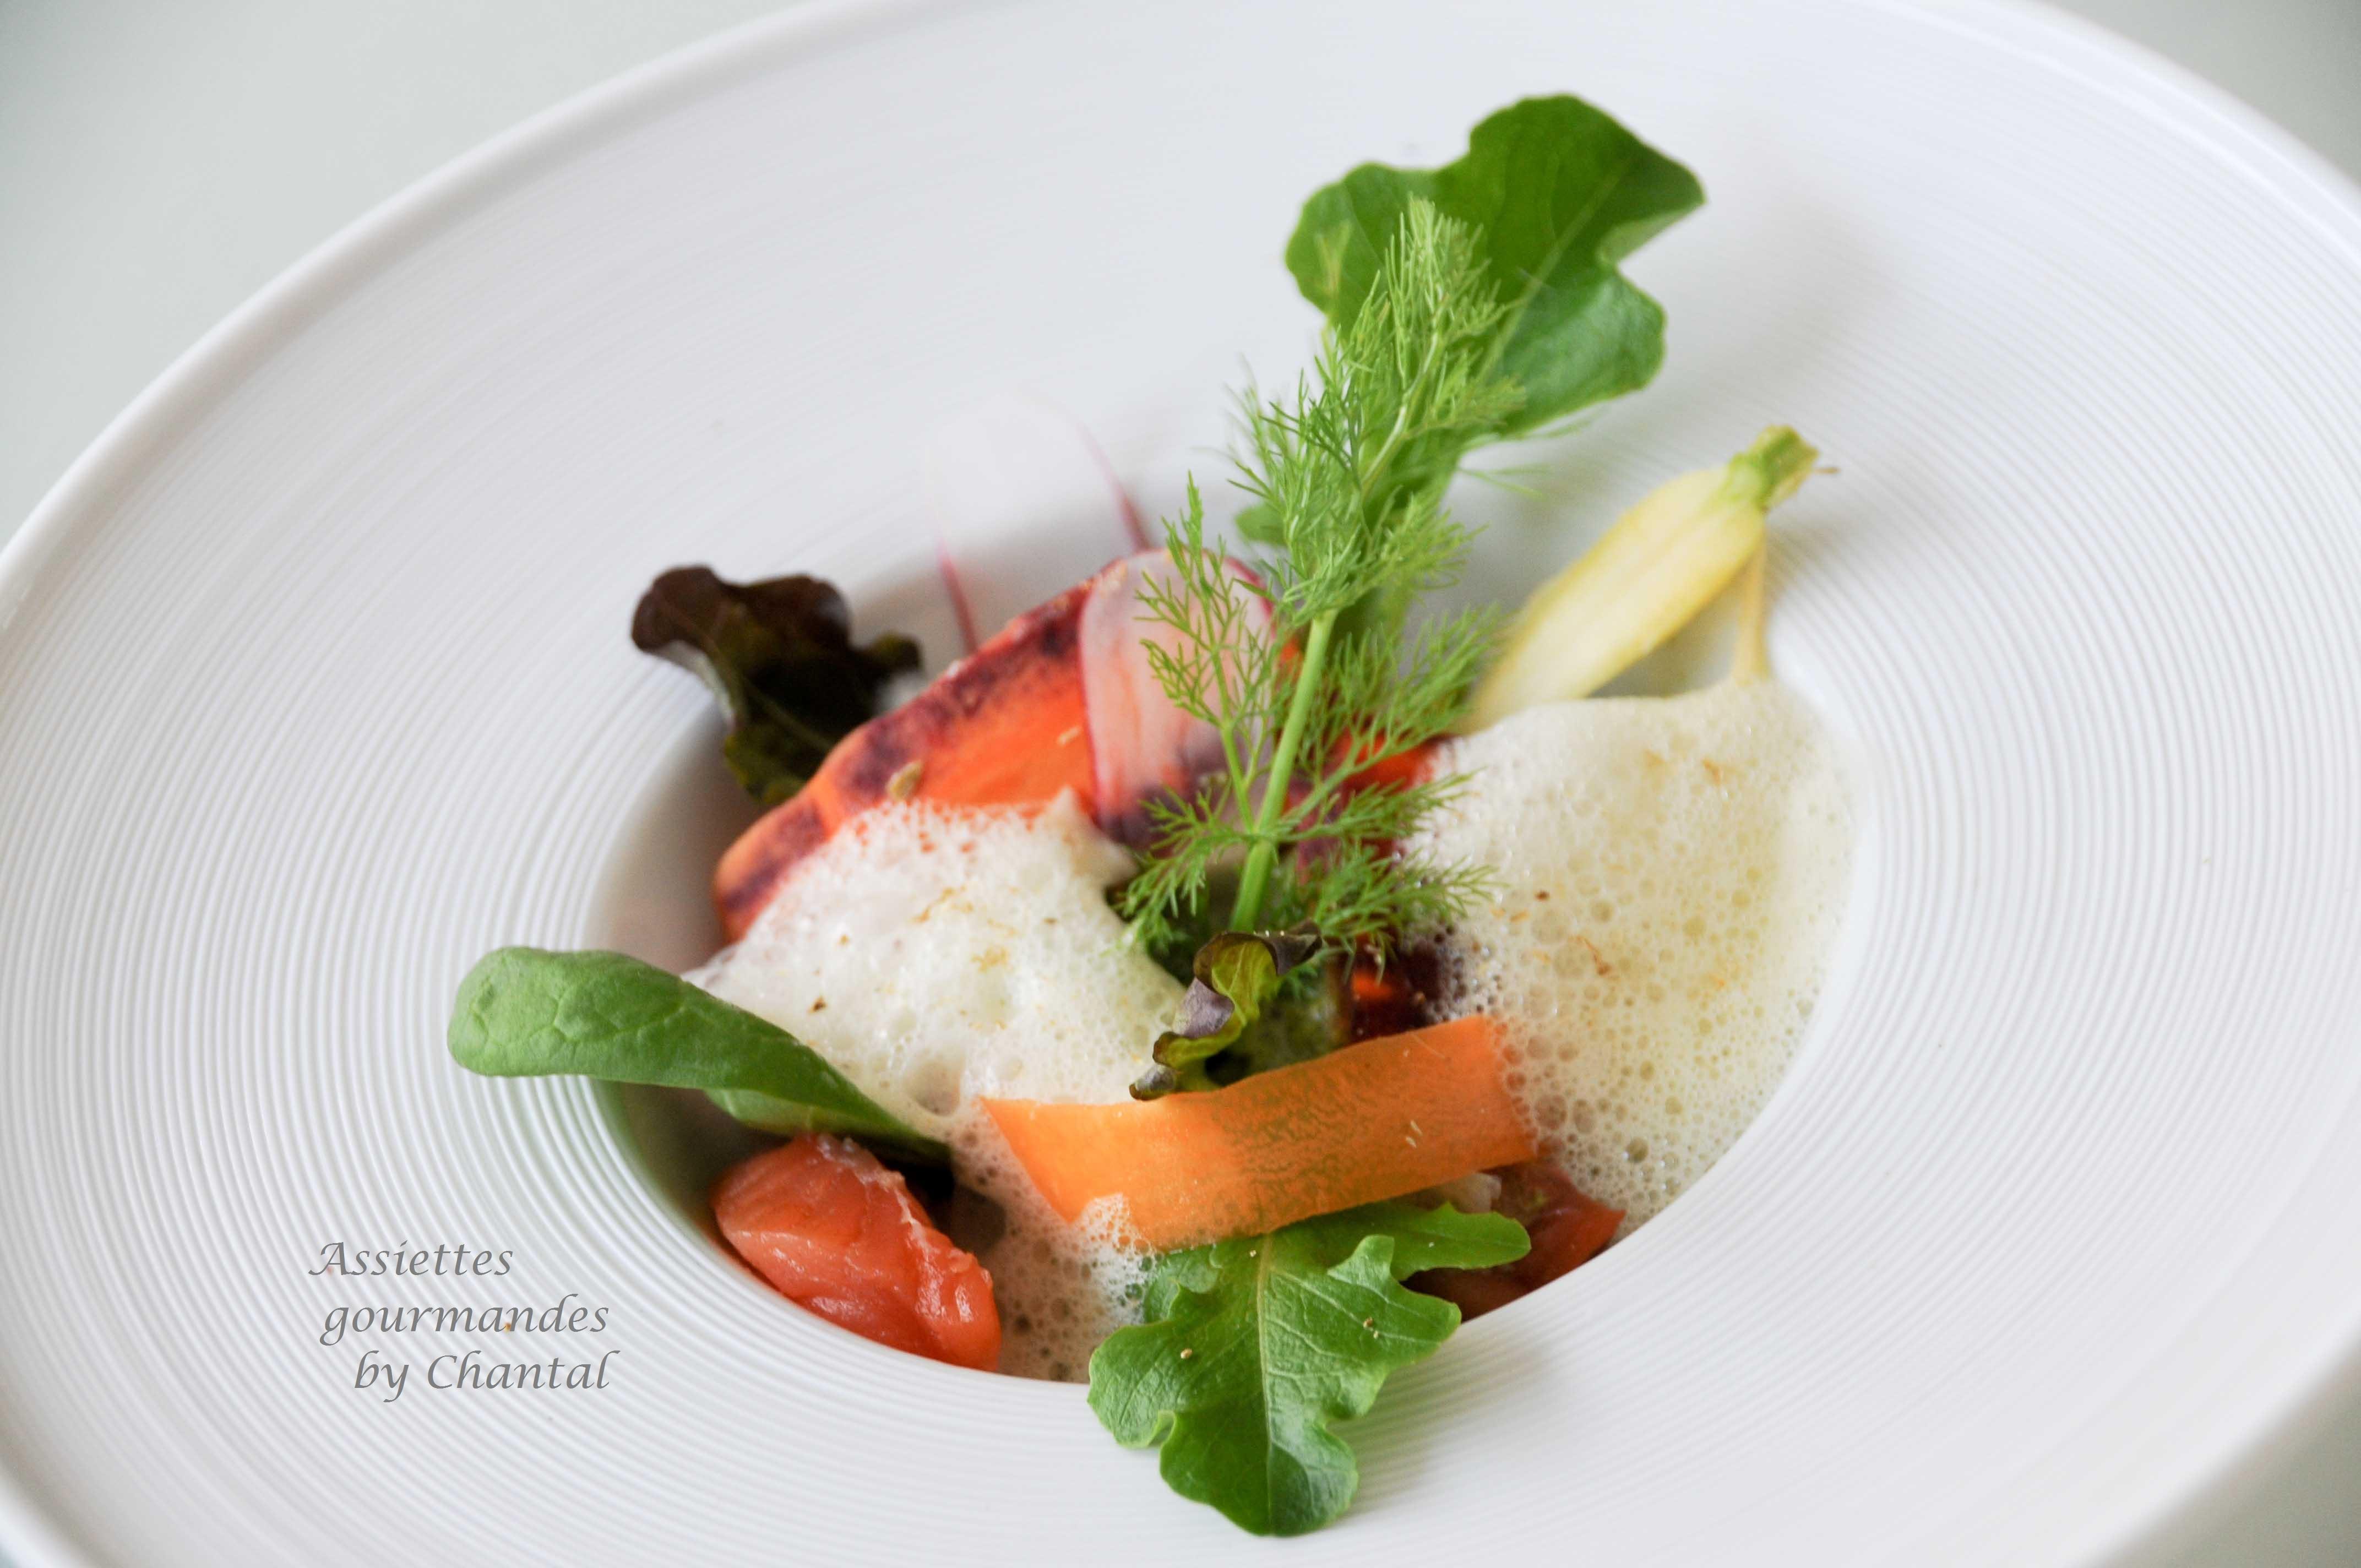 Salade de légumes croquants façon Kei Kobayashi